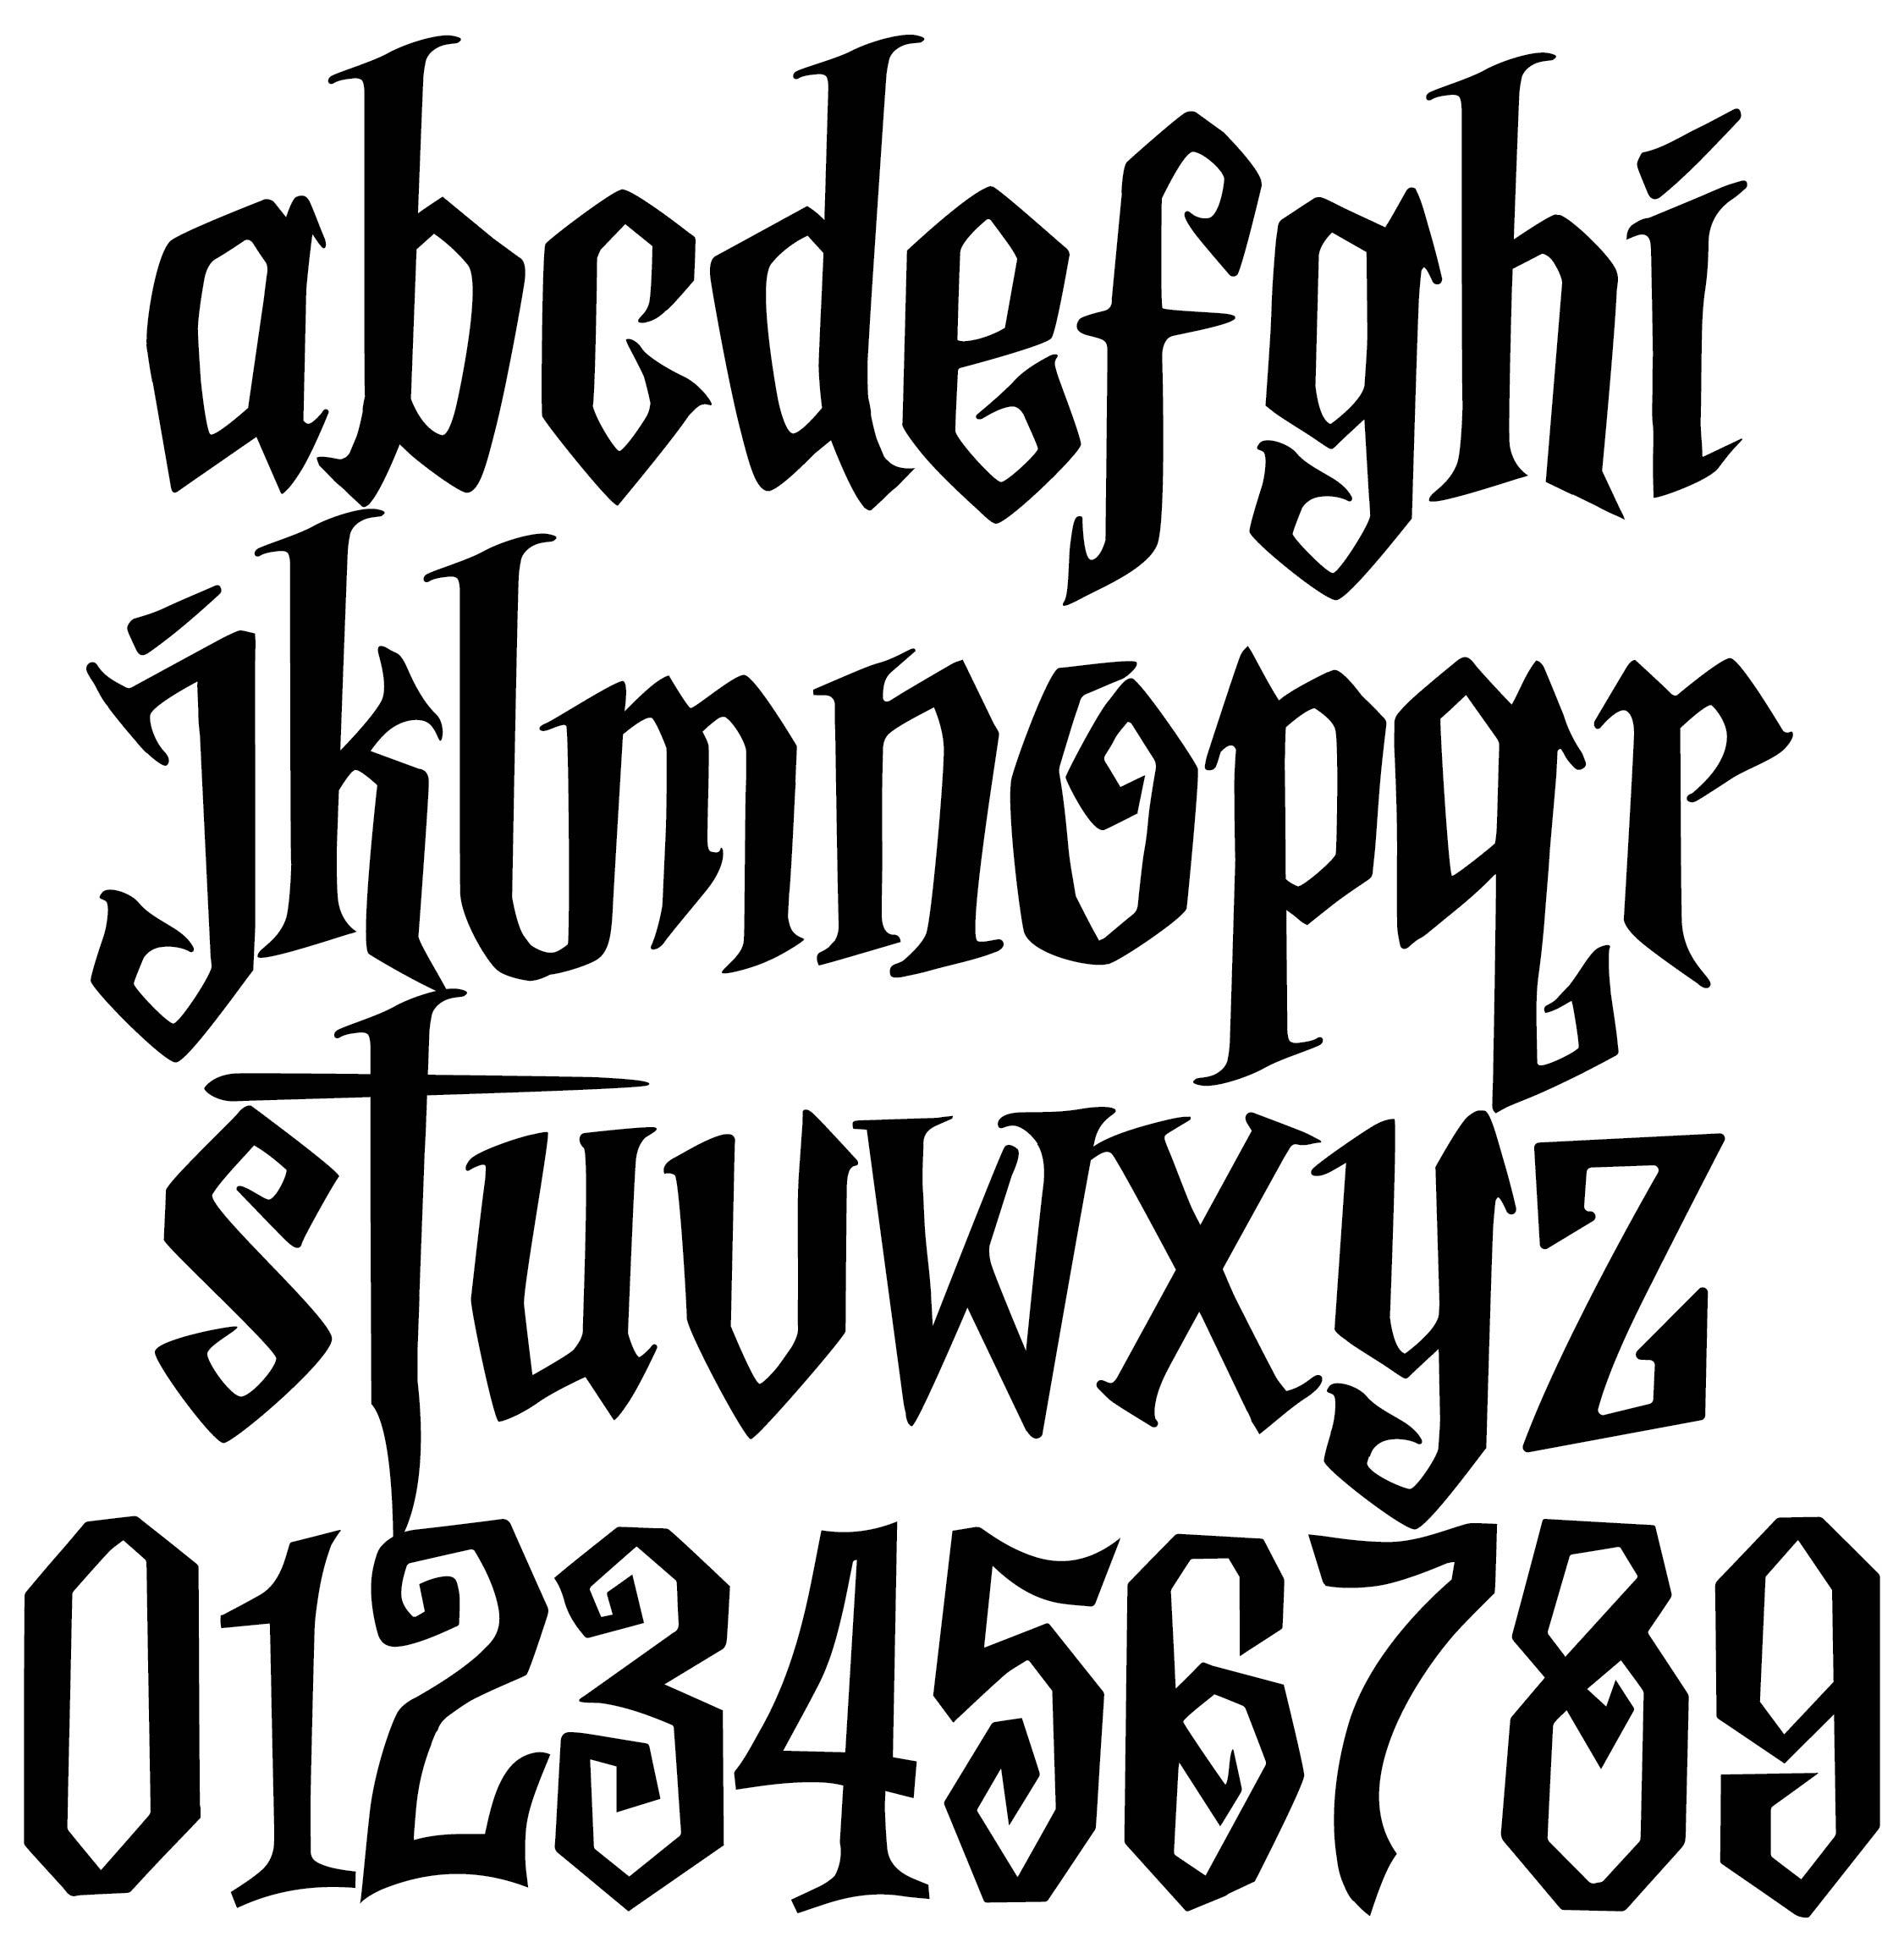 Spooky Halloween Alphabet Letters